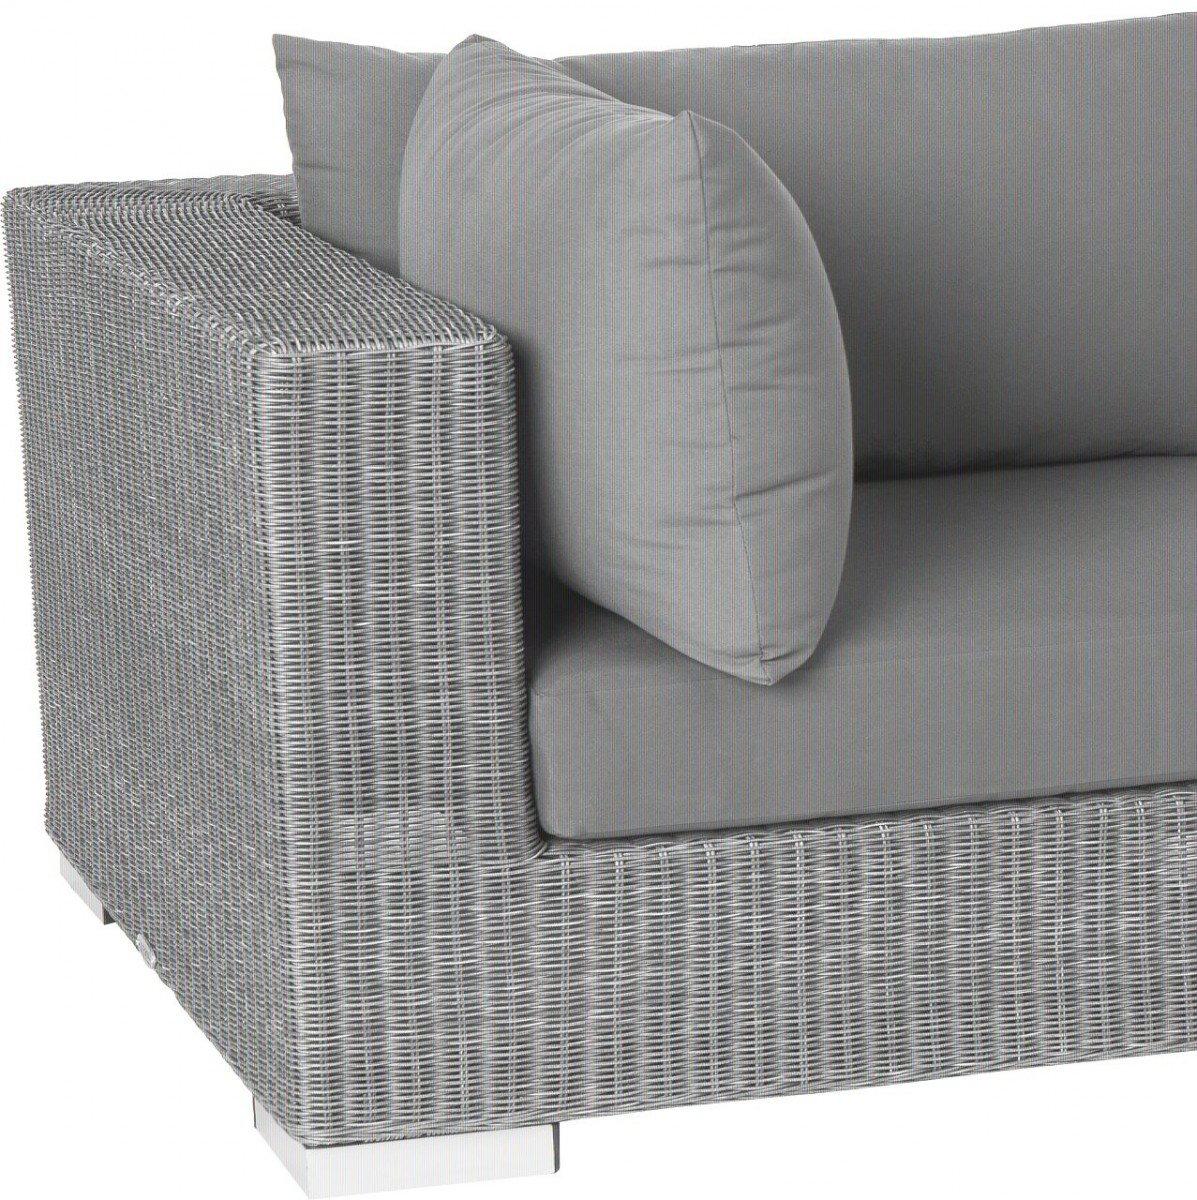 Dreams4Home Eckelement 'Quincy' - Sitz, Sofa, Stuhl, Eckelement, Terrassenmöbel, Loungemöbel, Cocktailmöbel, B/H/T: 87 x 64,5 x 87 cm, Gartenmöbel inklusive Kissen, Rattan, Aluminiumgestell, in grau